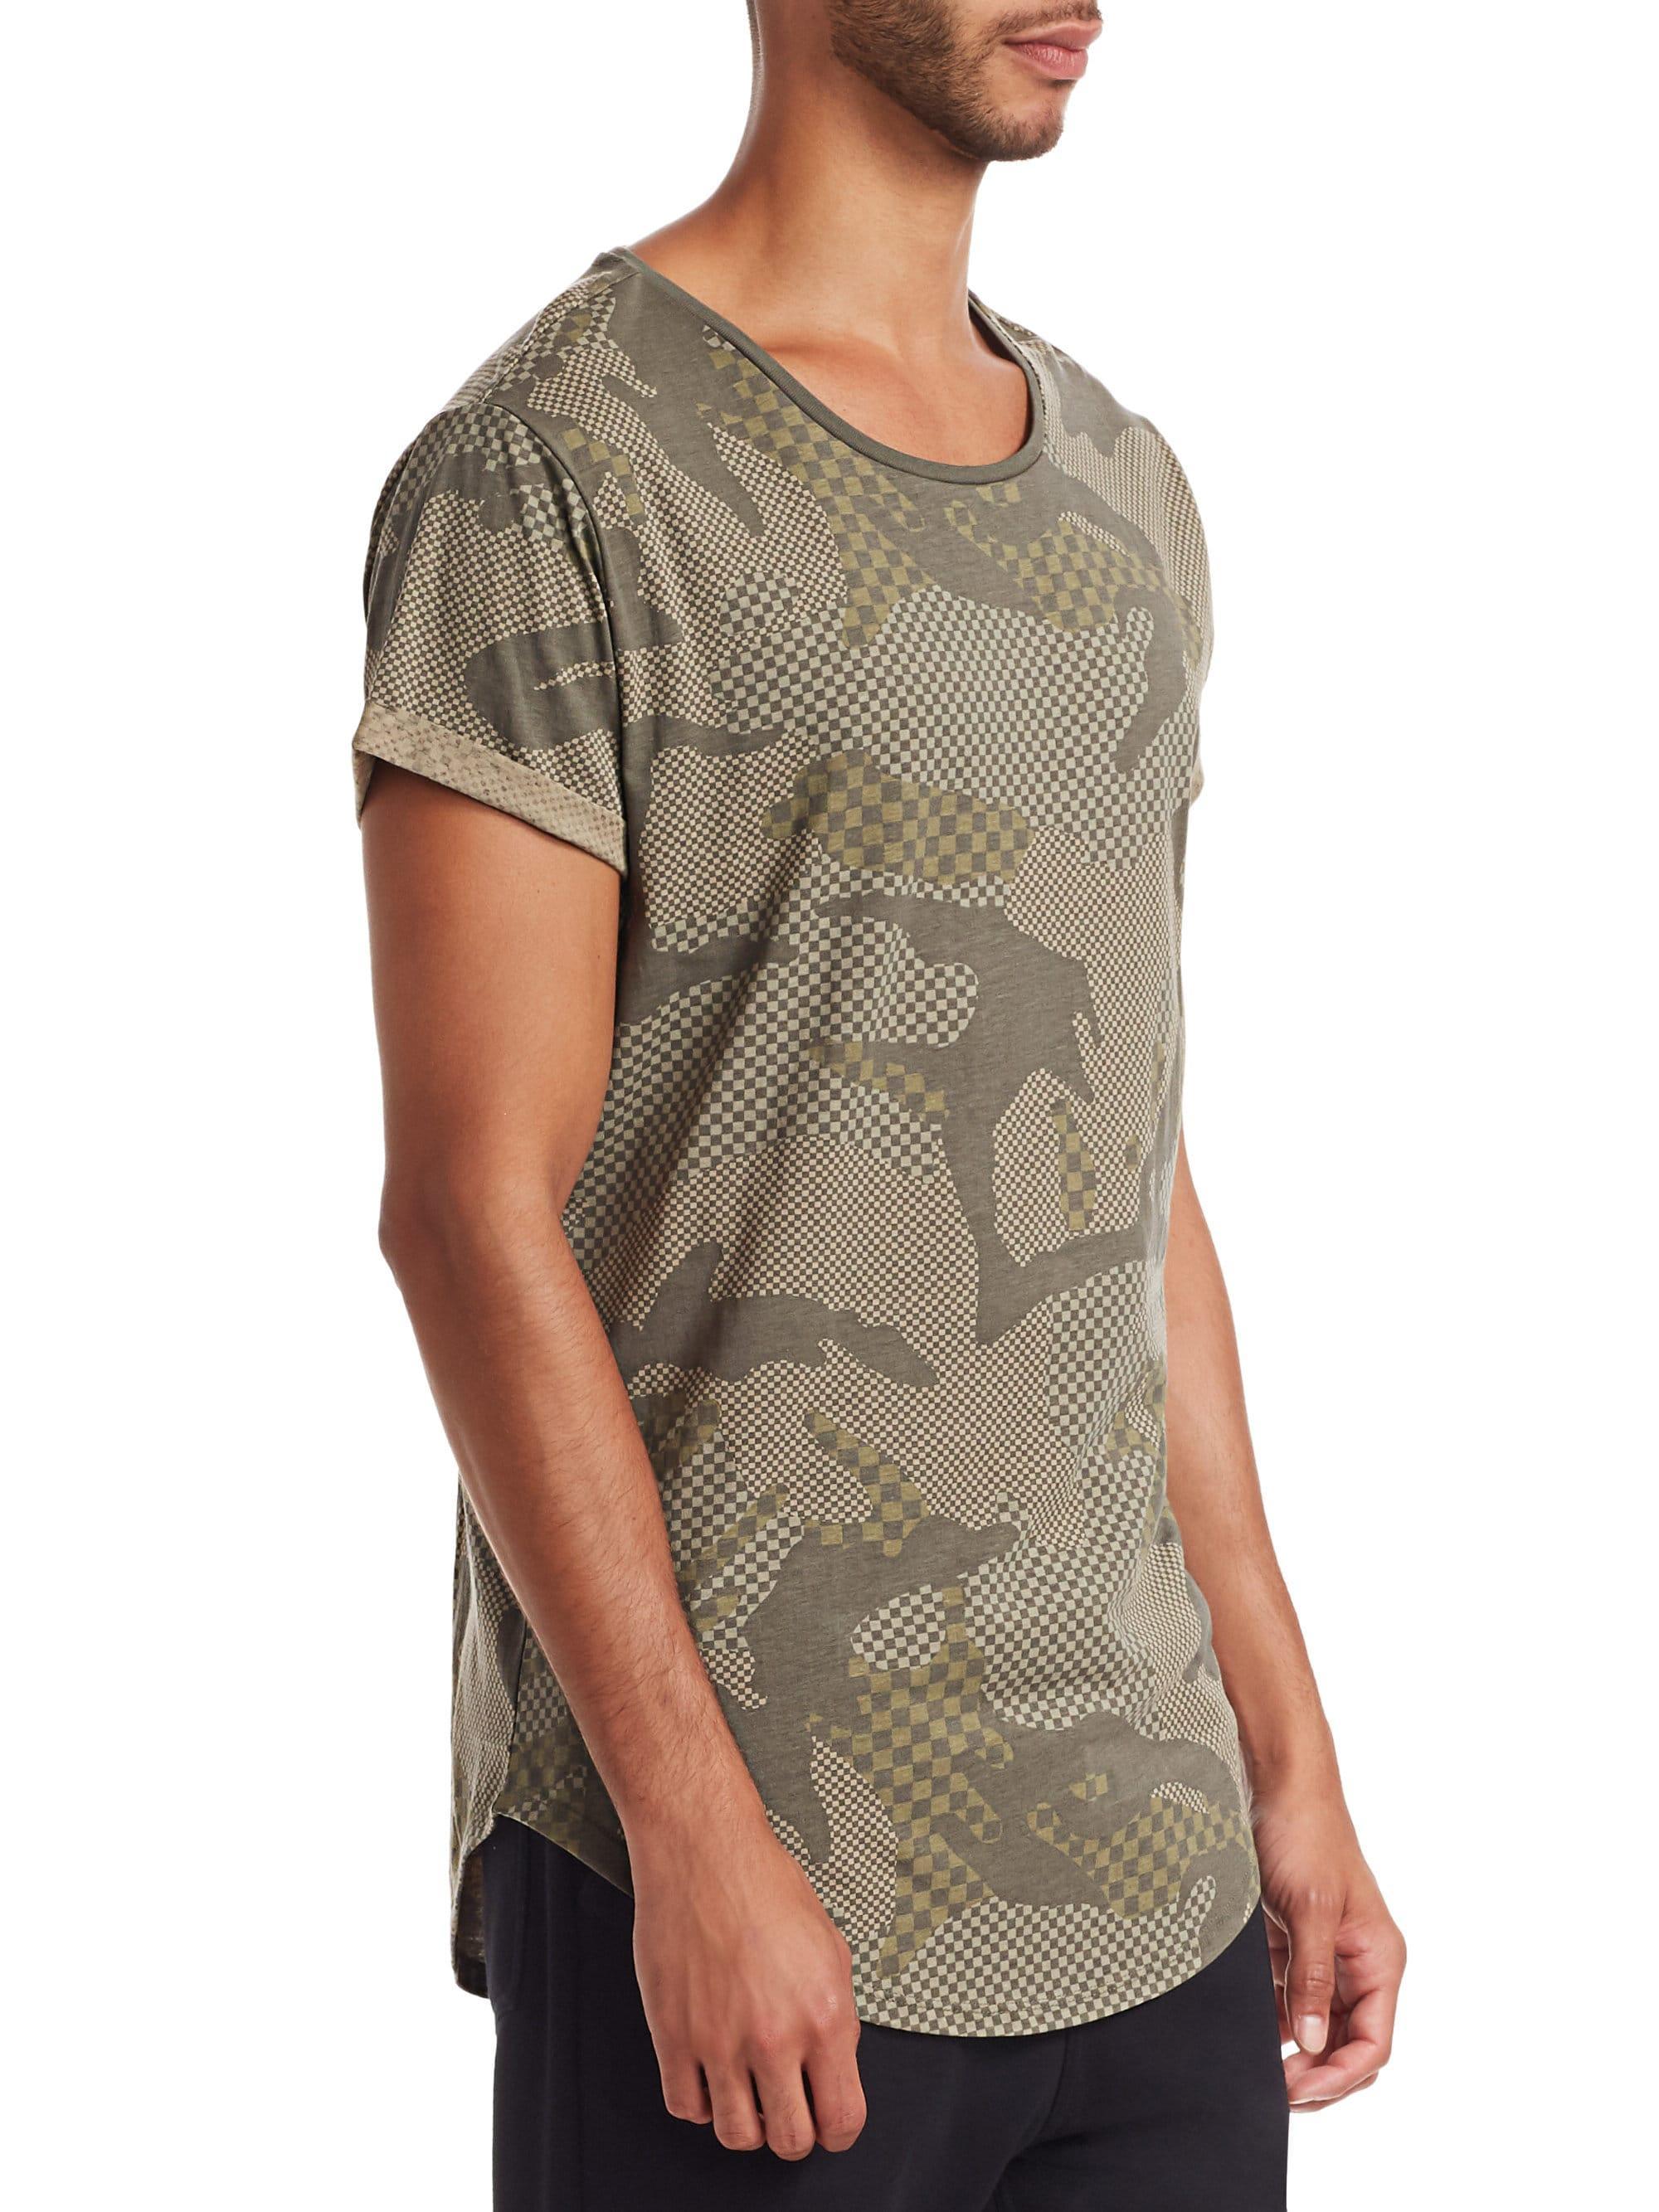 a5200e611a G-Star RAW Vontoni Camo T-shirt in Green for Men - Lyst